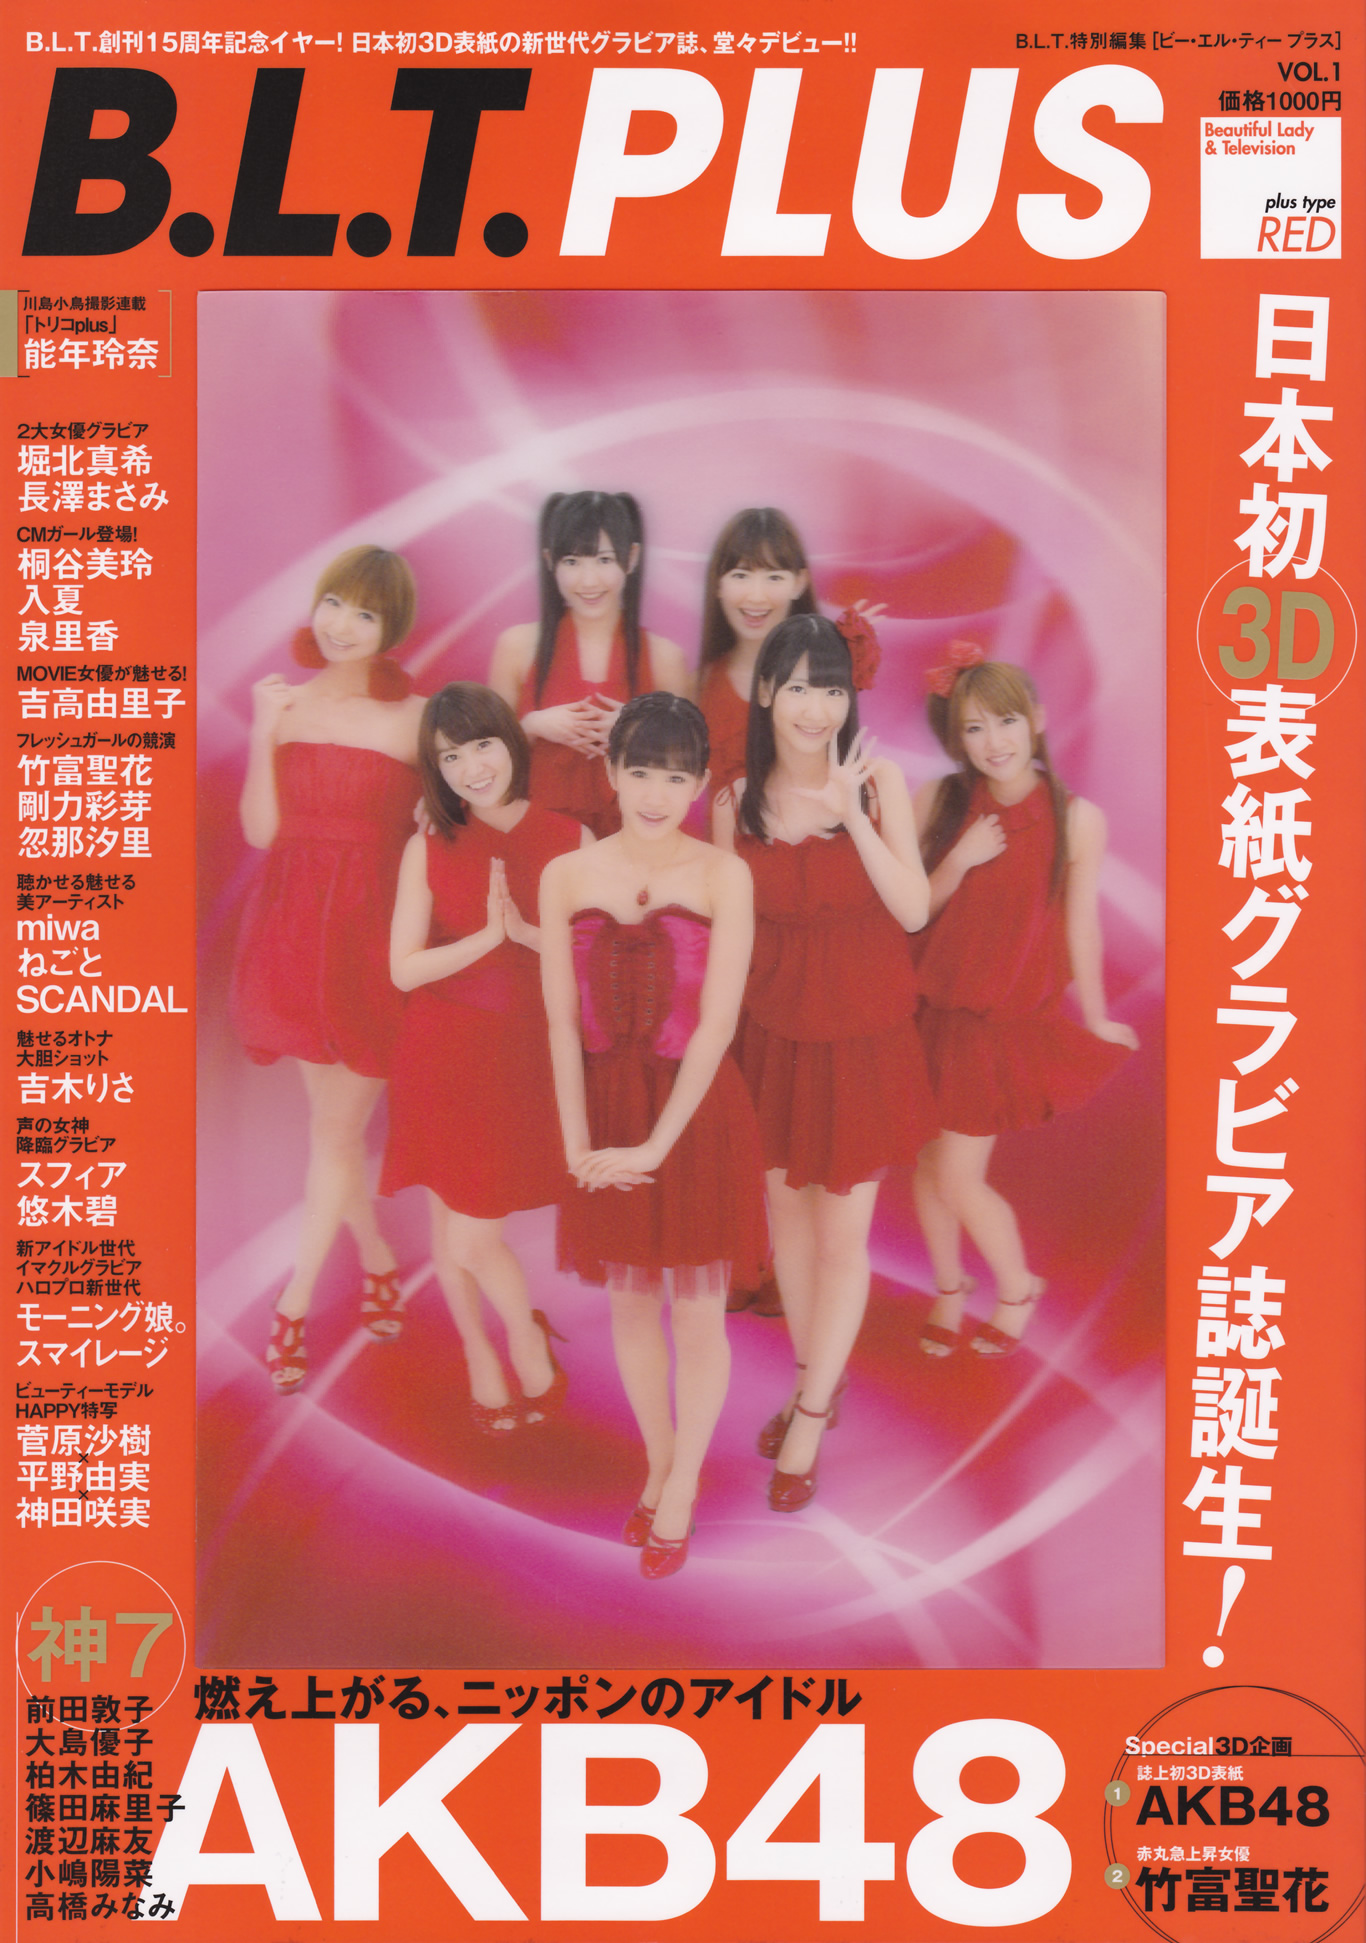 [B.L.T. PLUS] Vol.1 AKB48 [25P12MB]